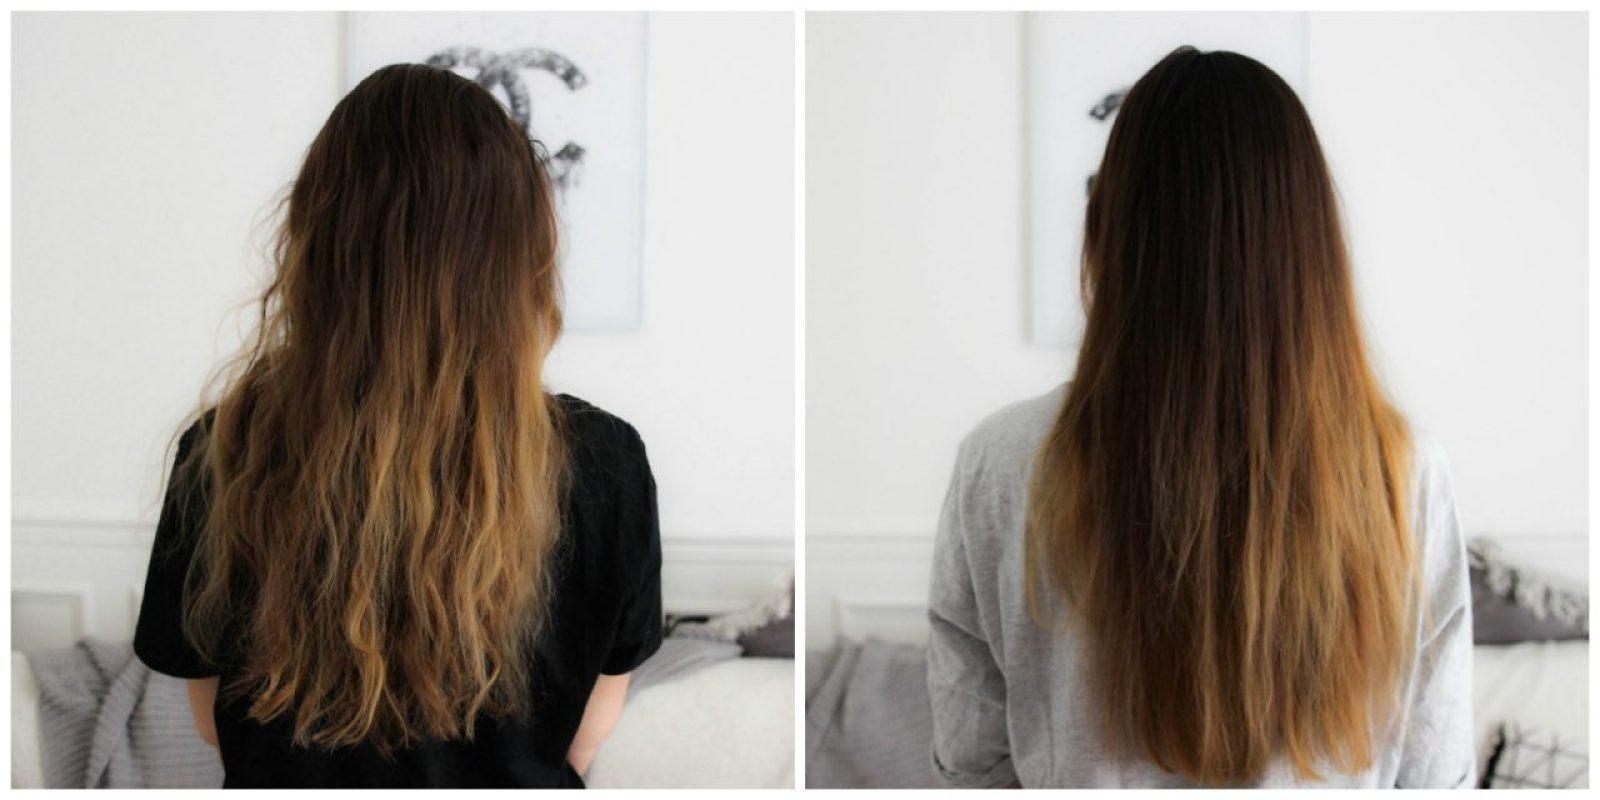 amika-cheveux-avis-avant-apres-1